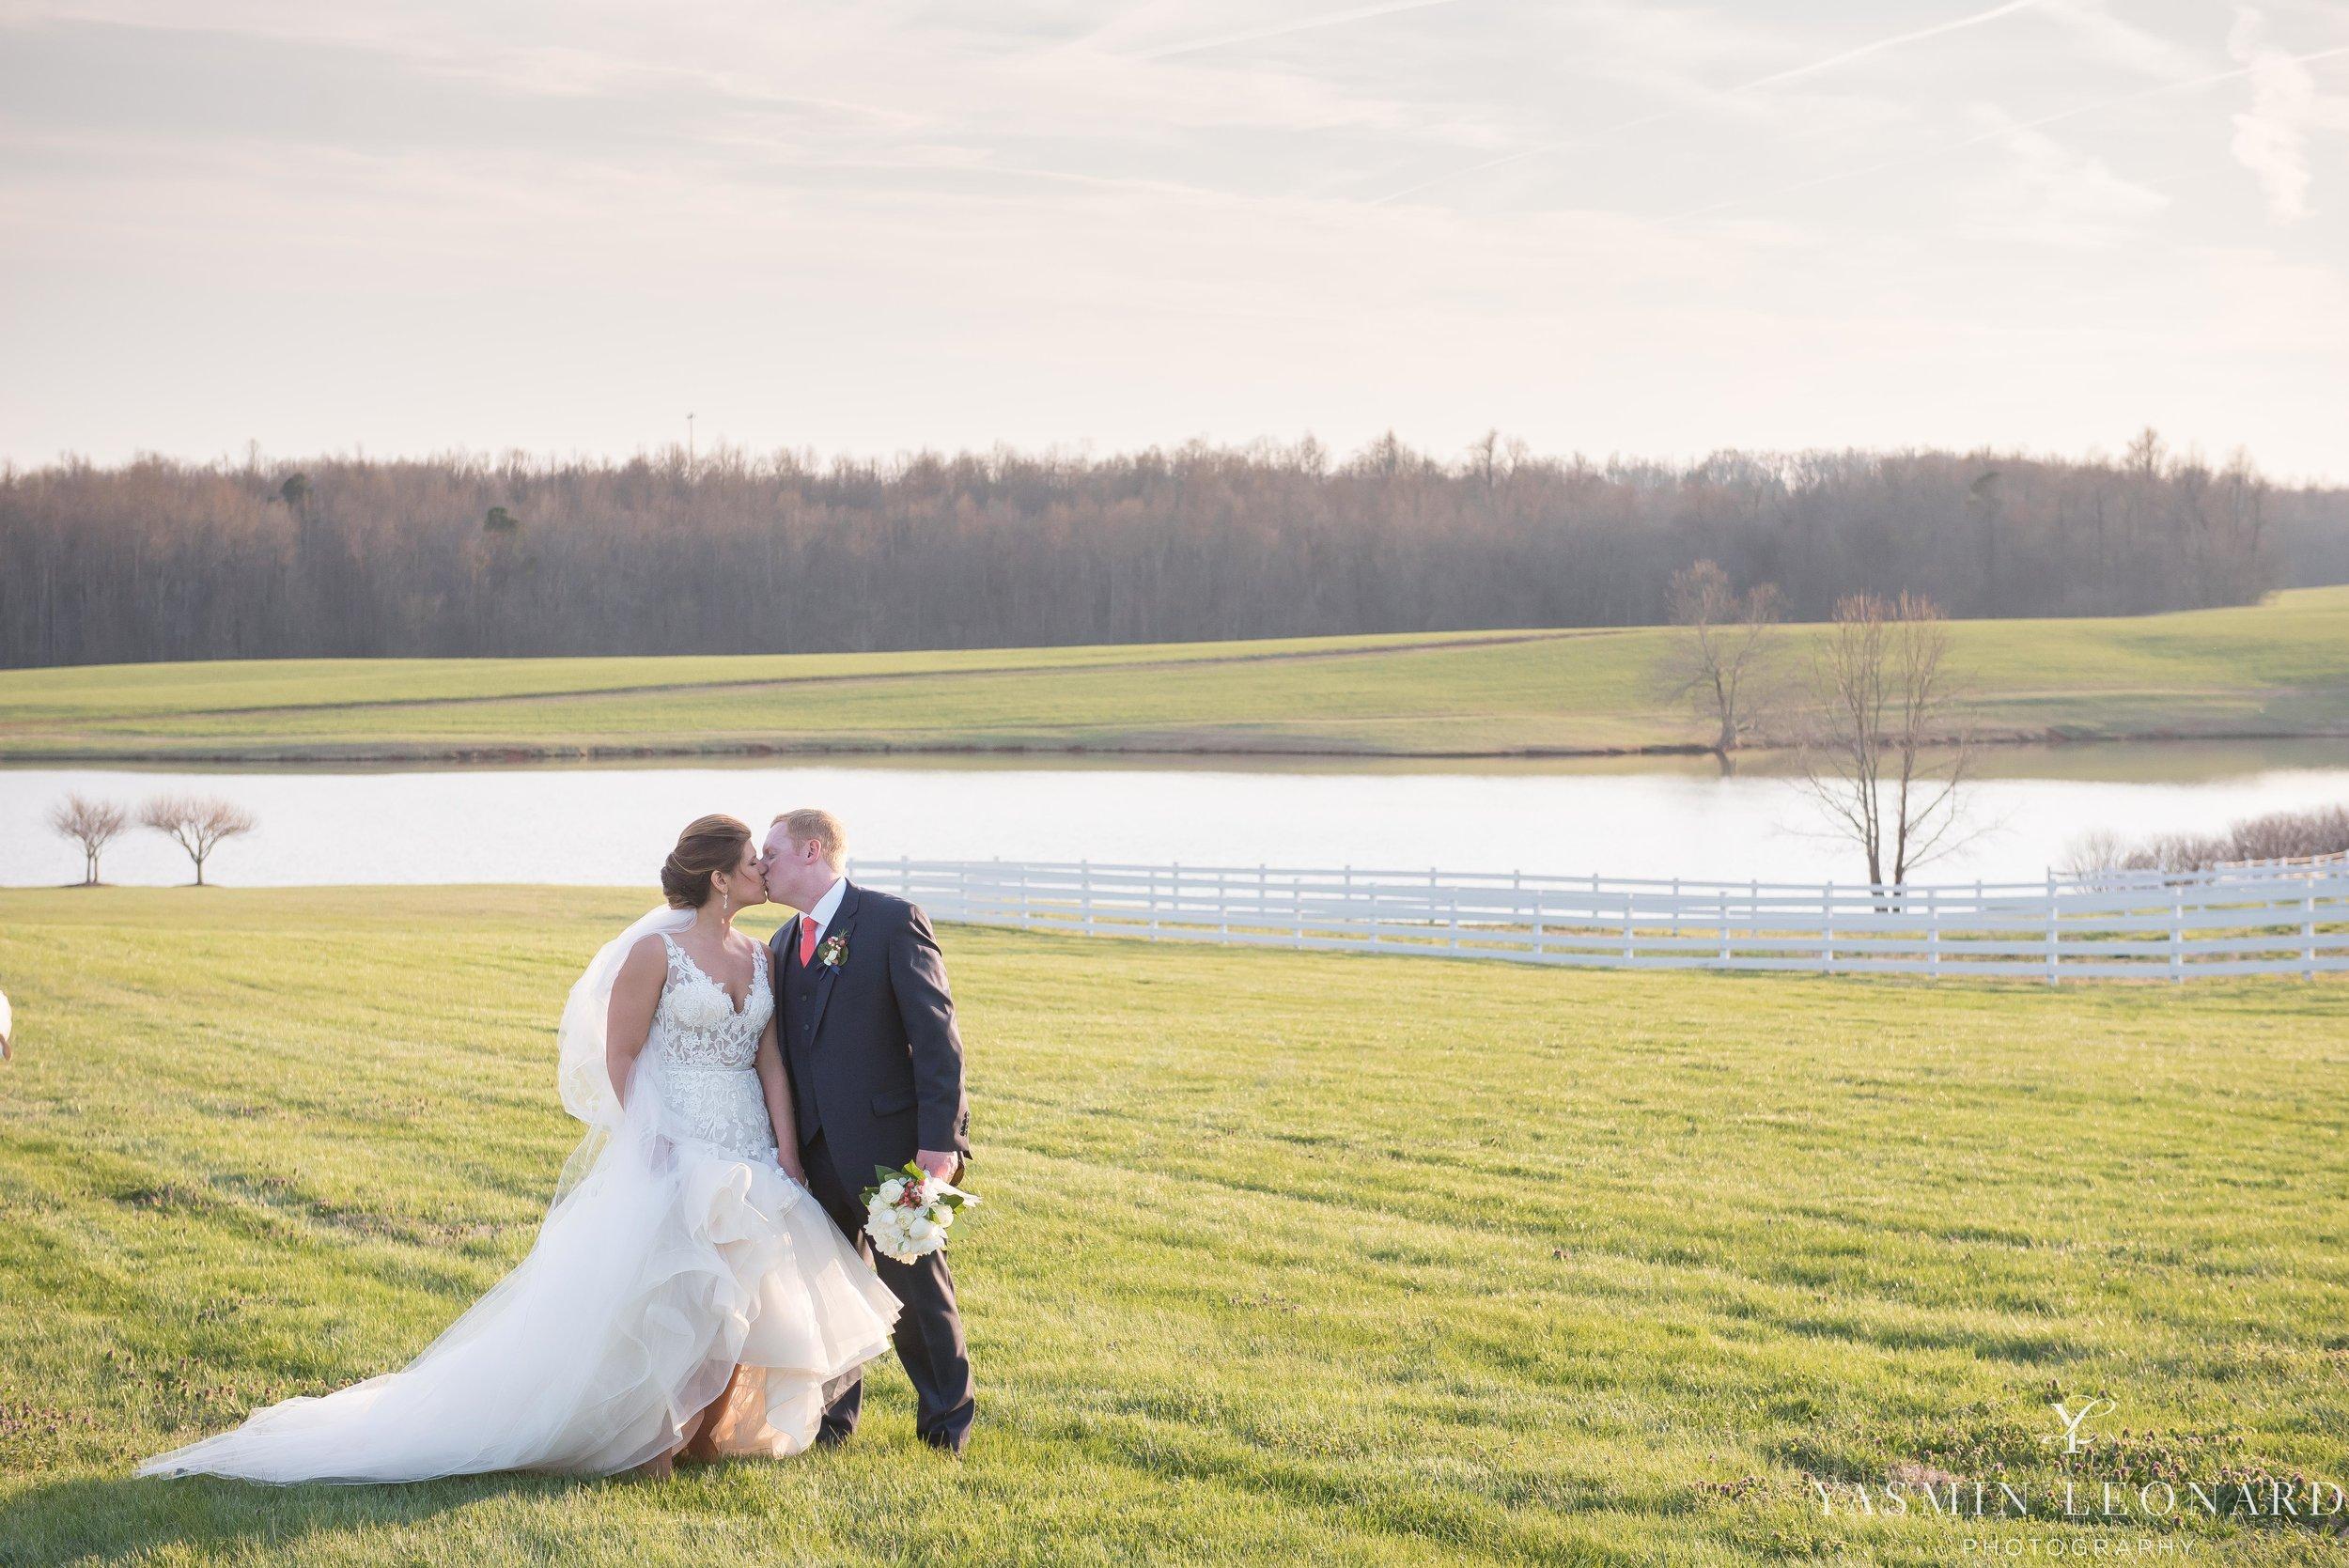 Adaumont Farm - Adaumont Farm Weddings - Trinity Weddings - NC Weddings - Yasmin Leonard Photography-55.jpg